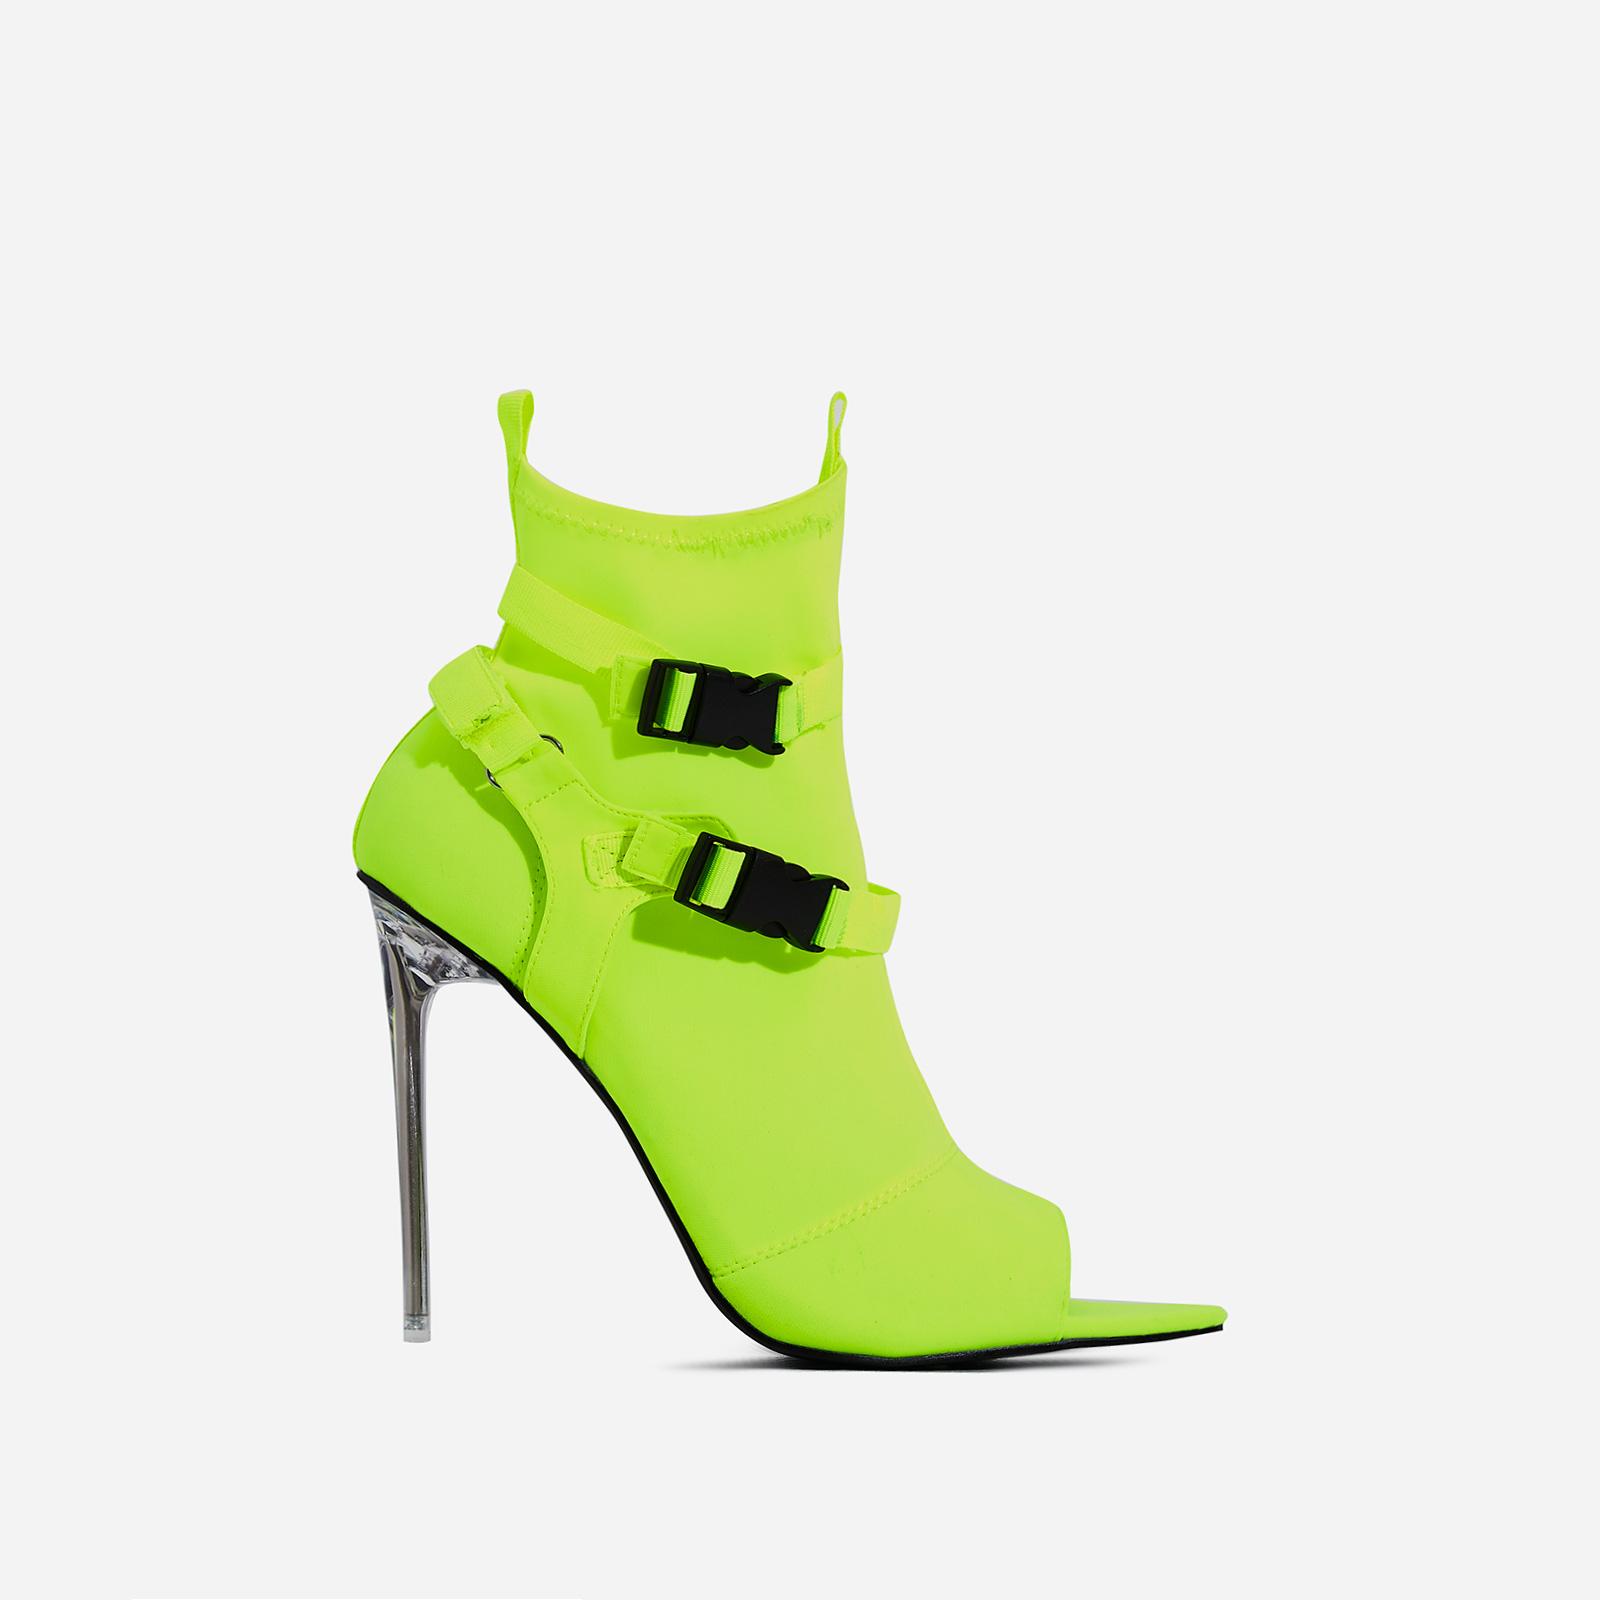 Lit Perspex Buckle Detail Pointed Peep Toe Ankle Sock Boot In Green Lycra